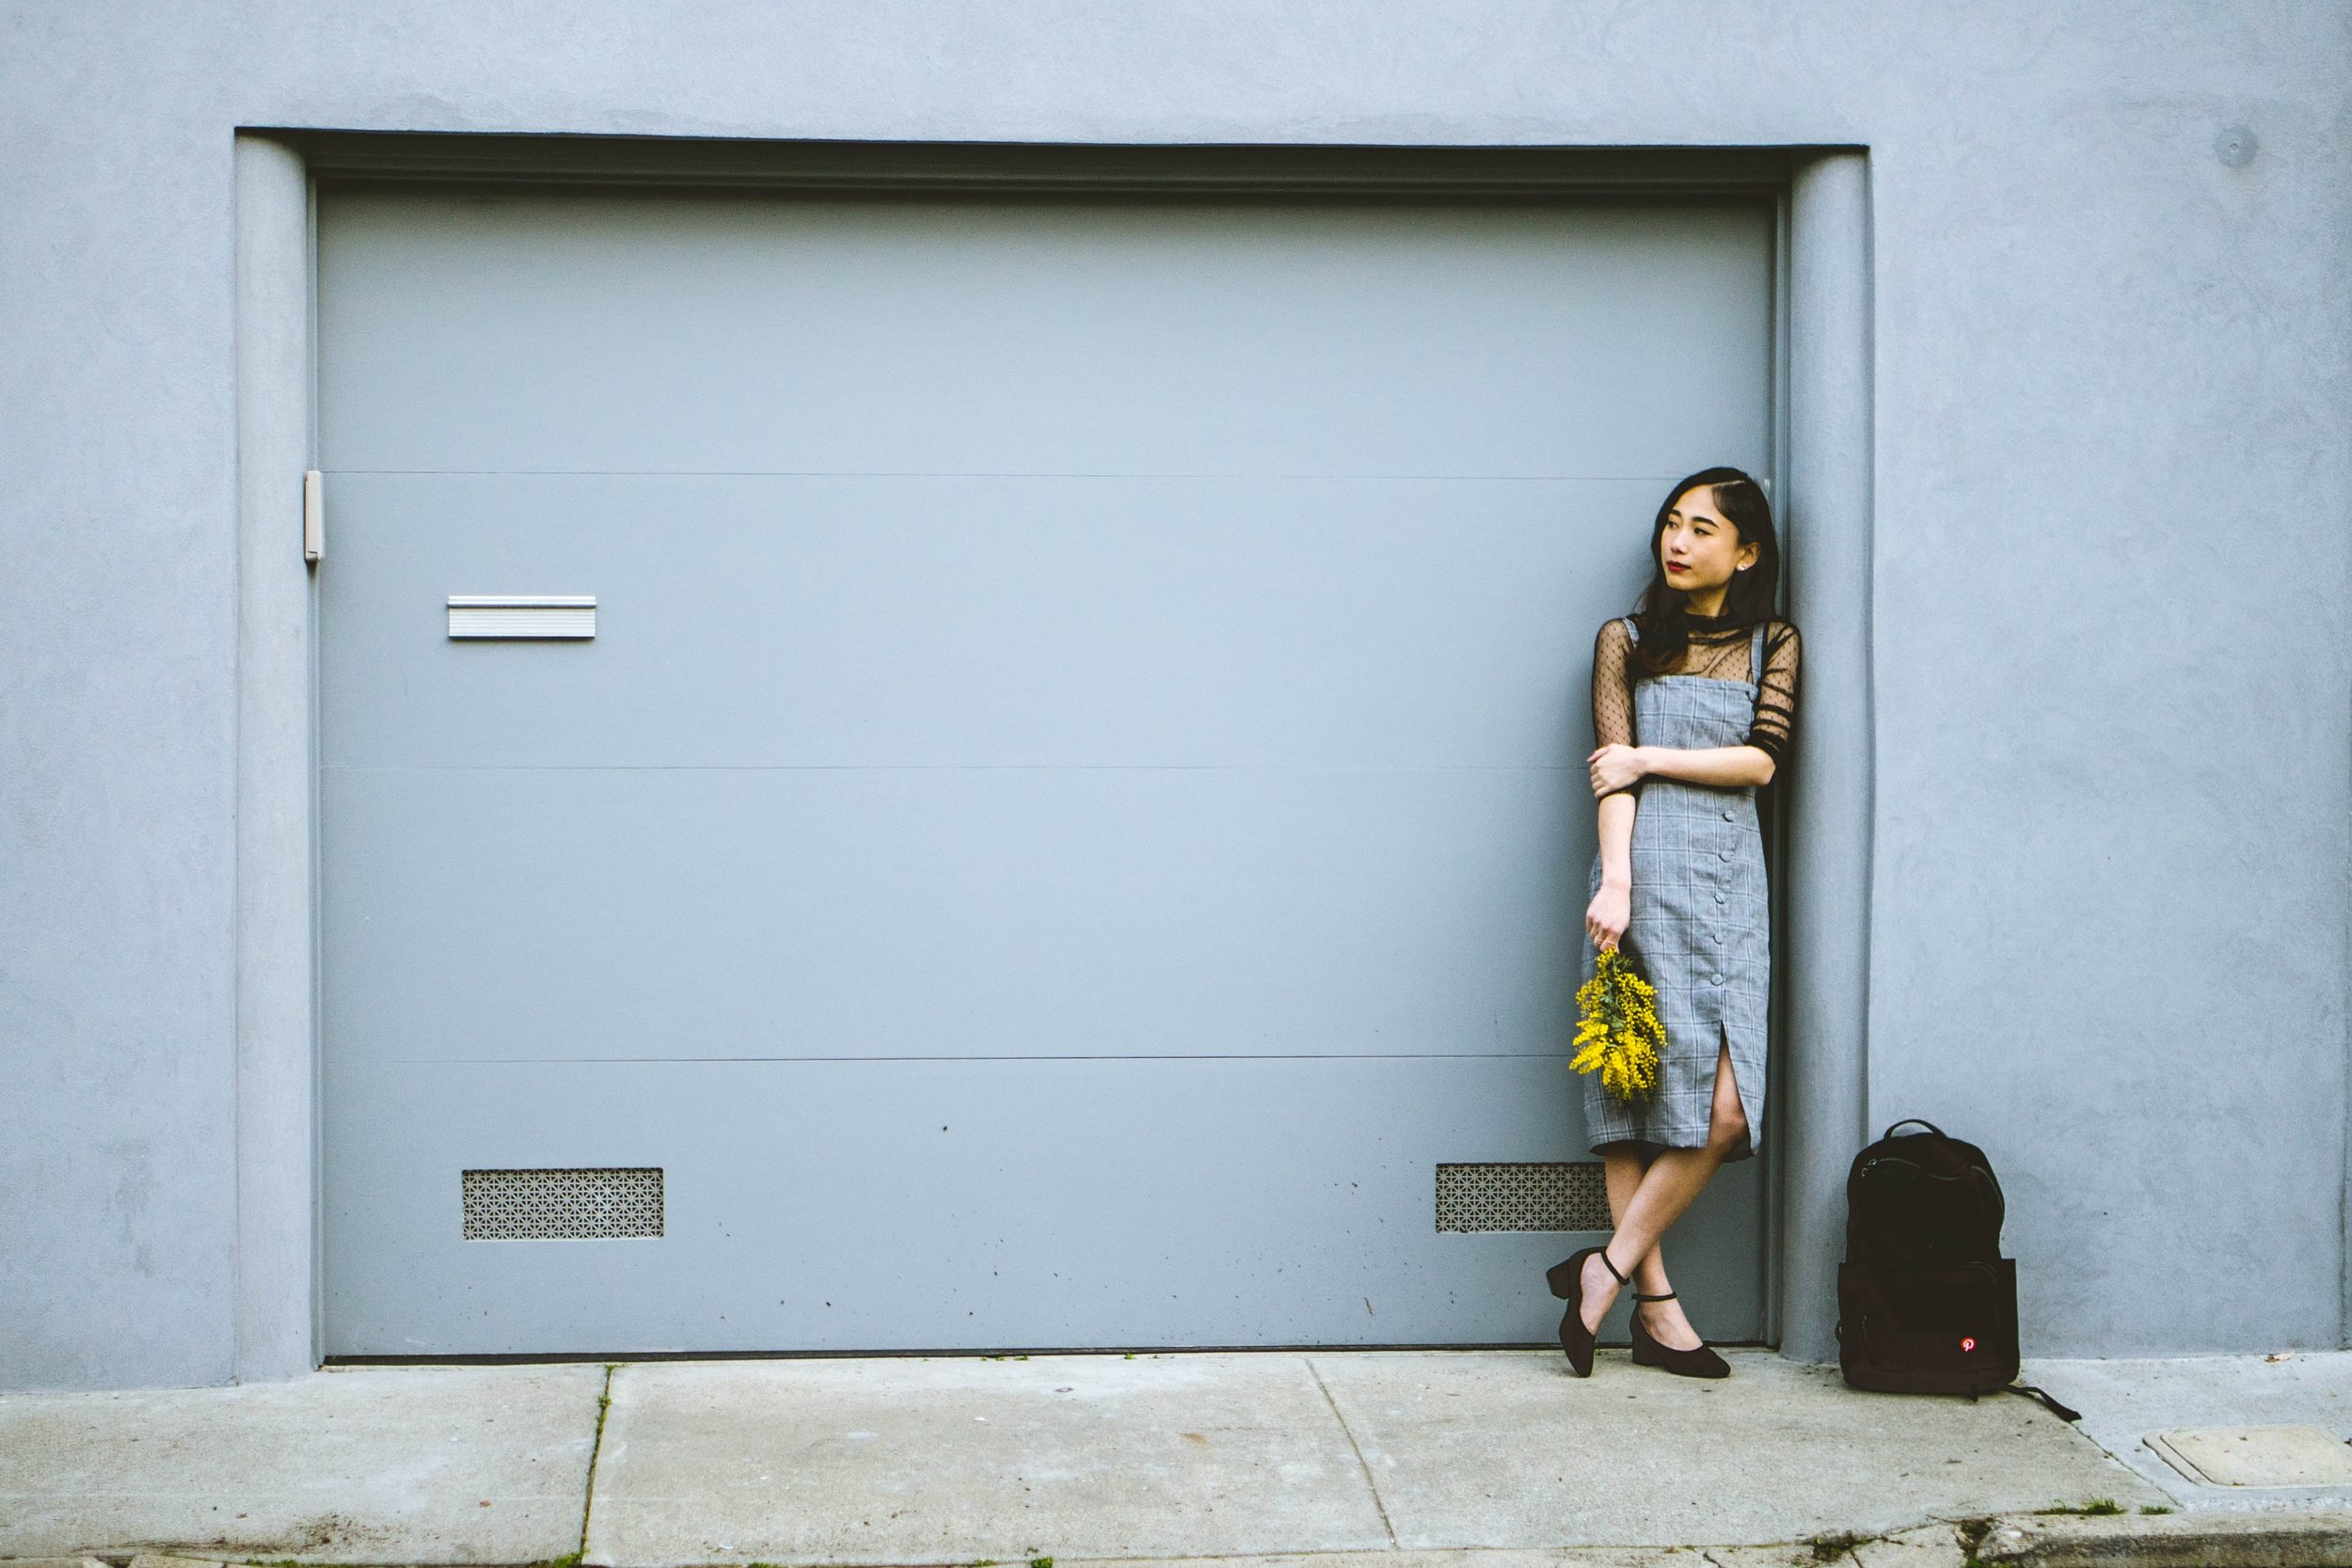 Dress: Eggie, Sheer Blouse: Styleaddict, Shoes: Sigerson Morrison, Backpack: Everlane